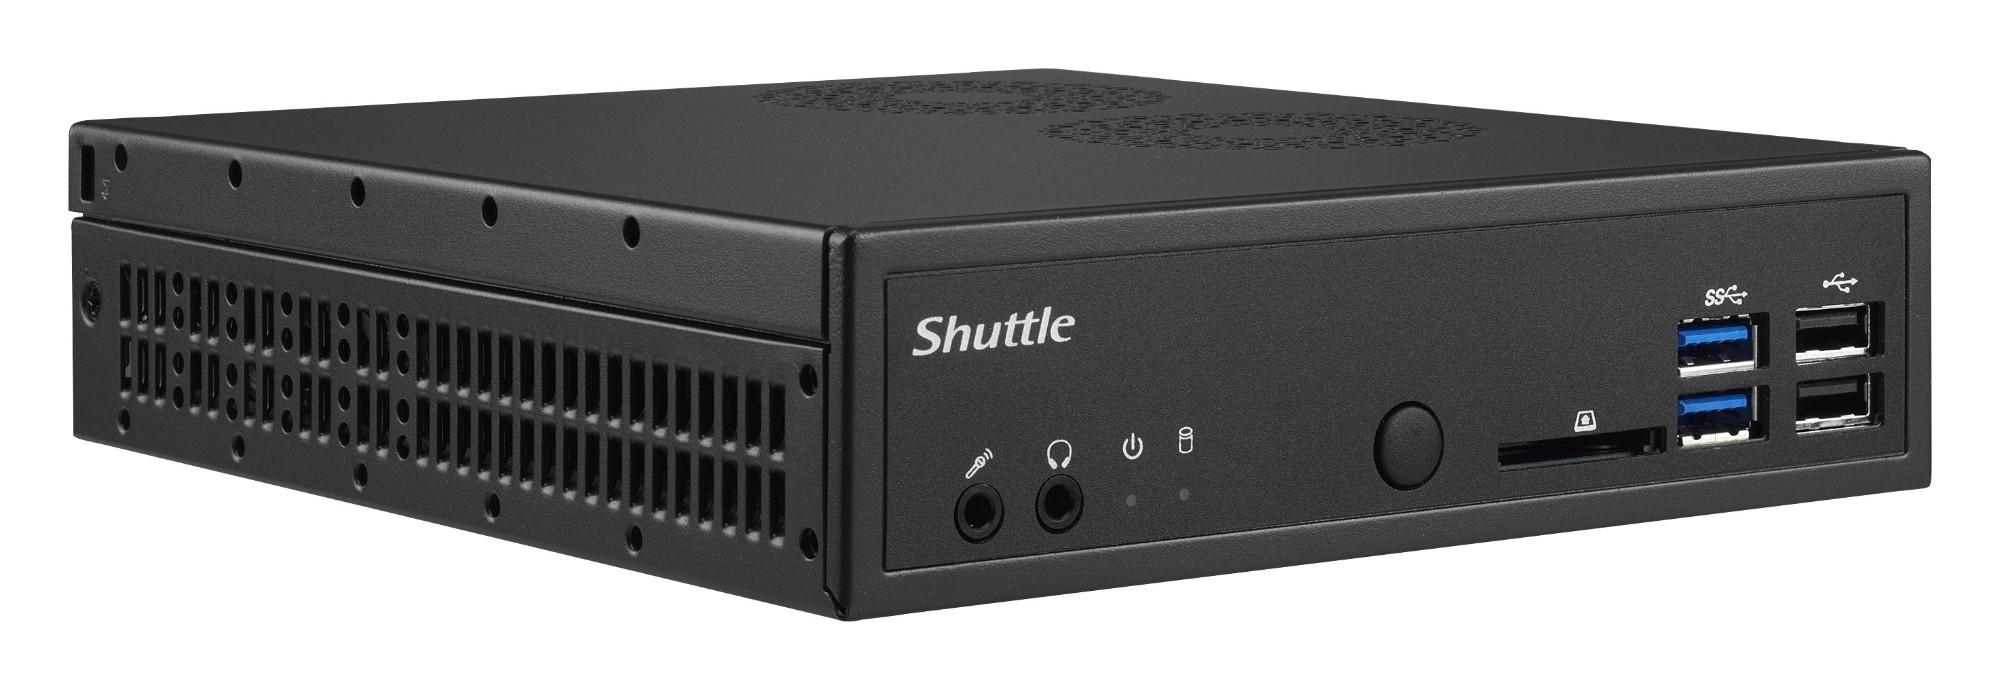 Shuttle XPС slim DH310 Intel® H310 LGA 1151 (Socket H4) 1.3L sized PC Black PC/workstation barebone